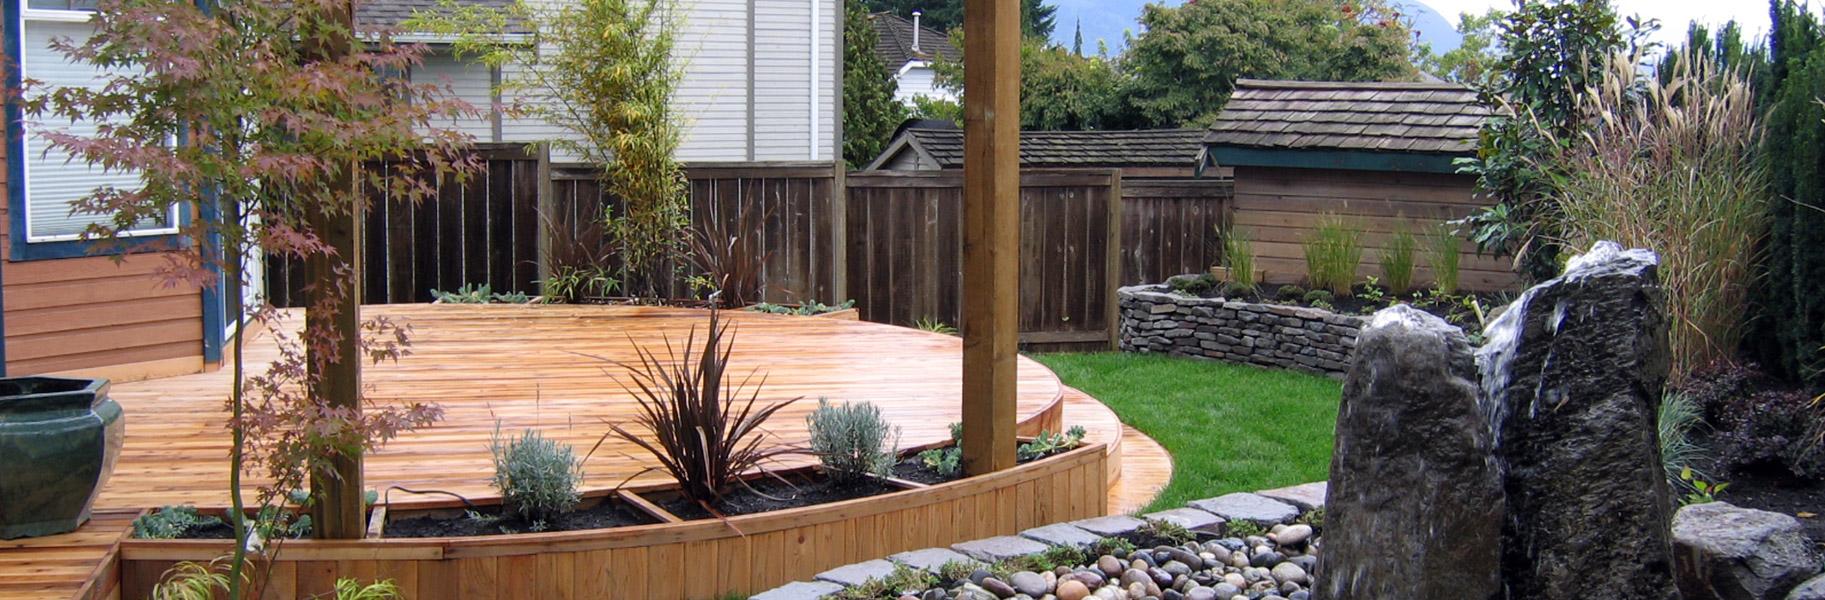 Wood patio with built in custom garden planters